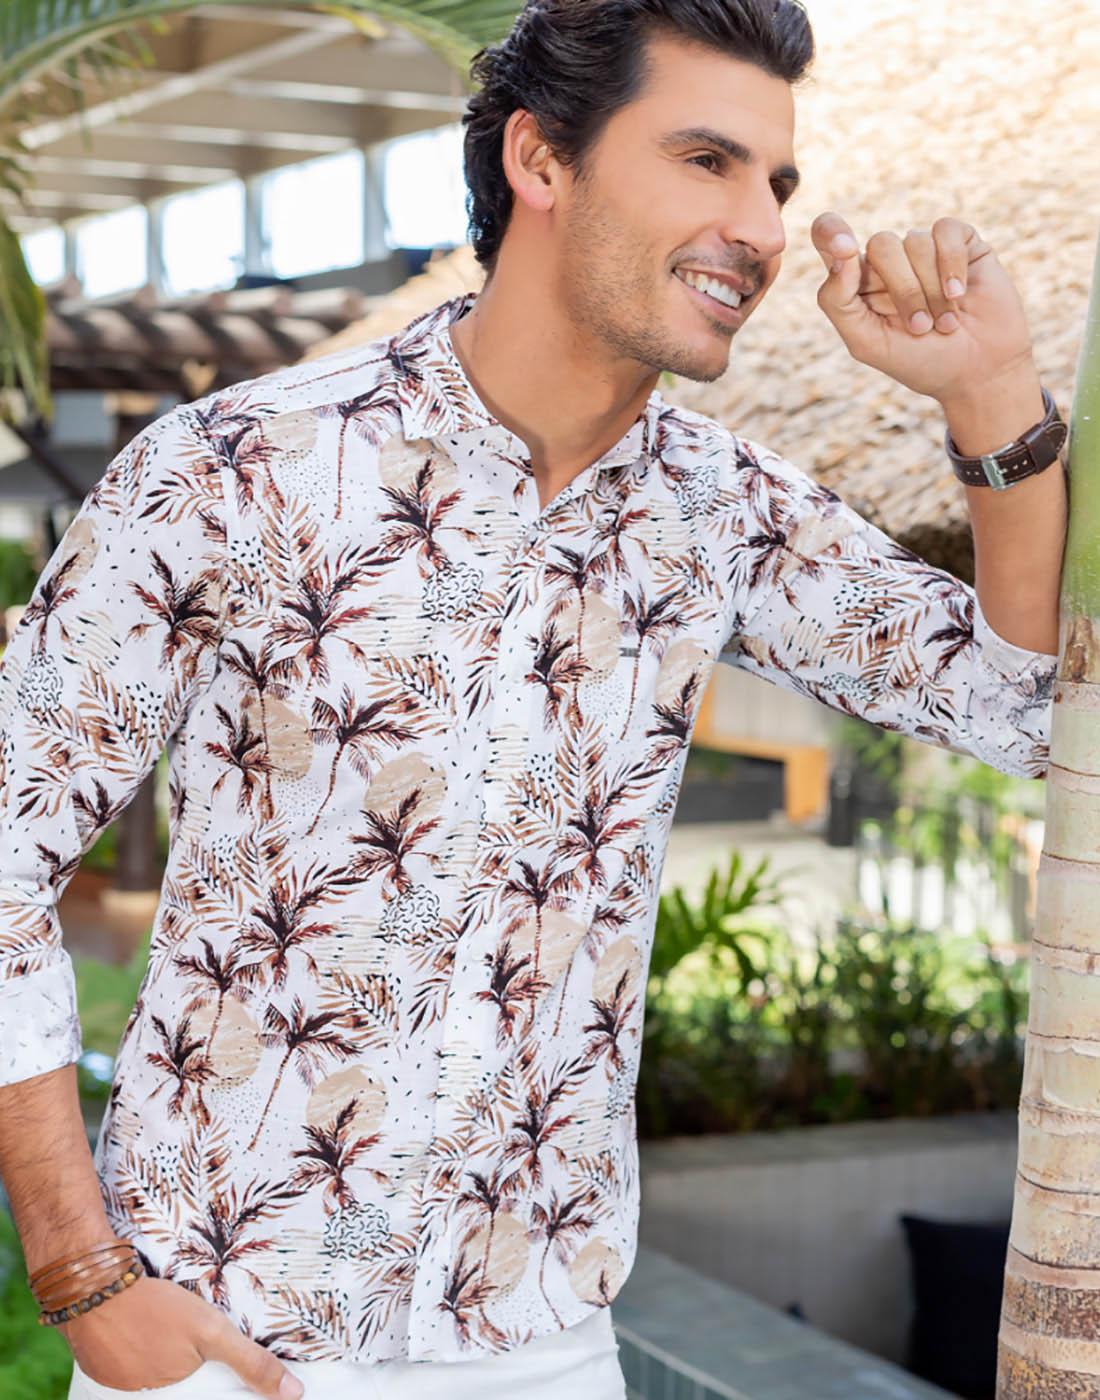 Camisa Manga Longa Estampada Floral - Baumgarten BGT